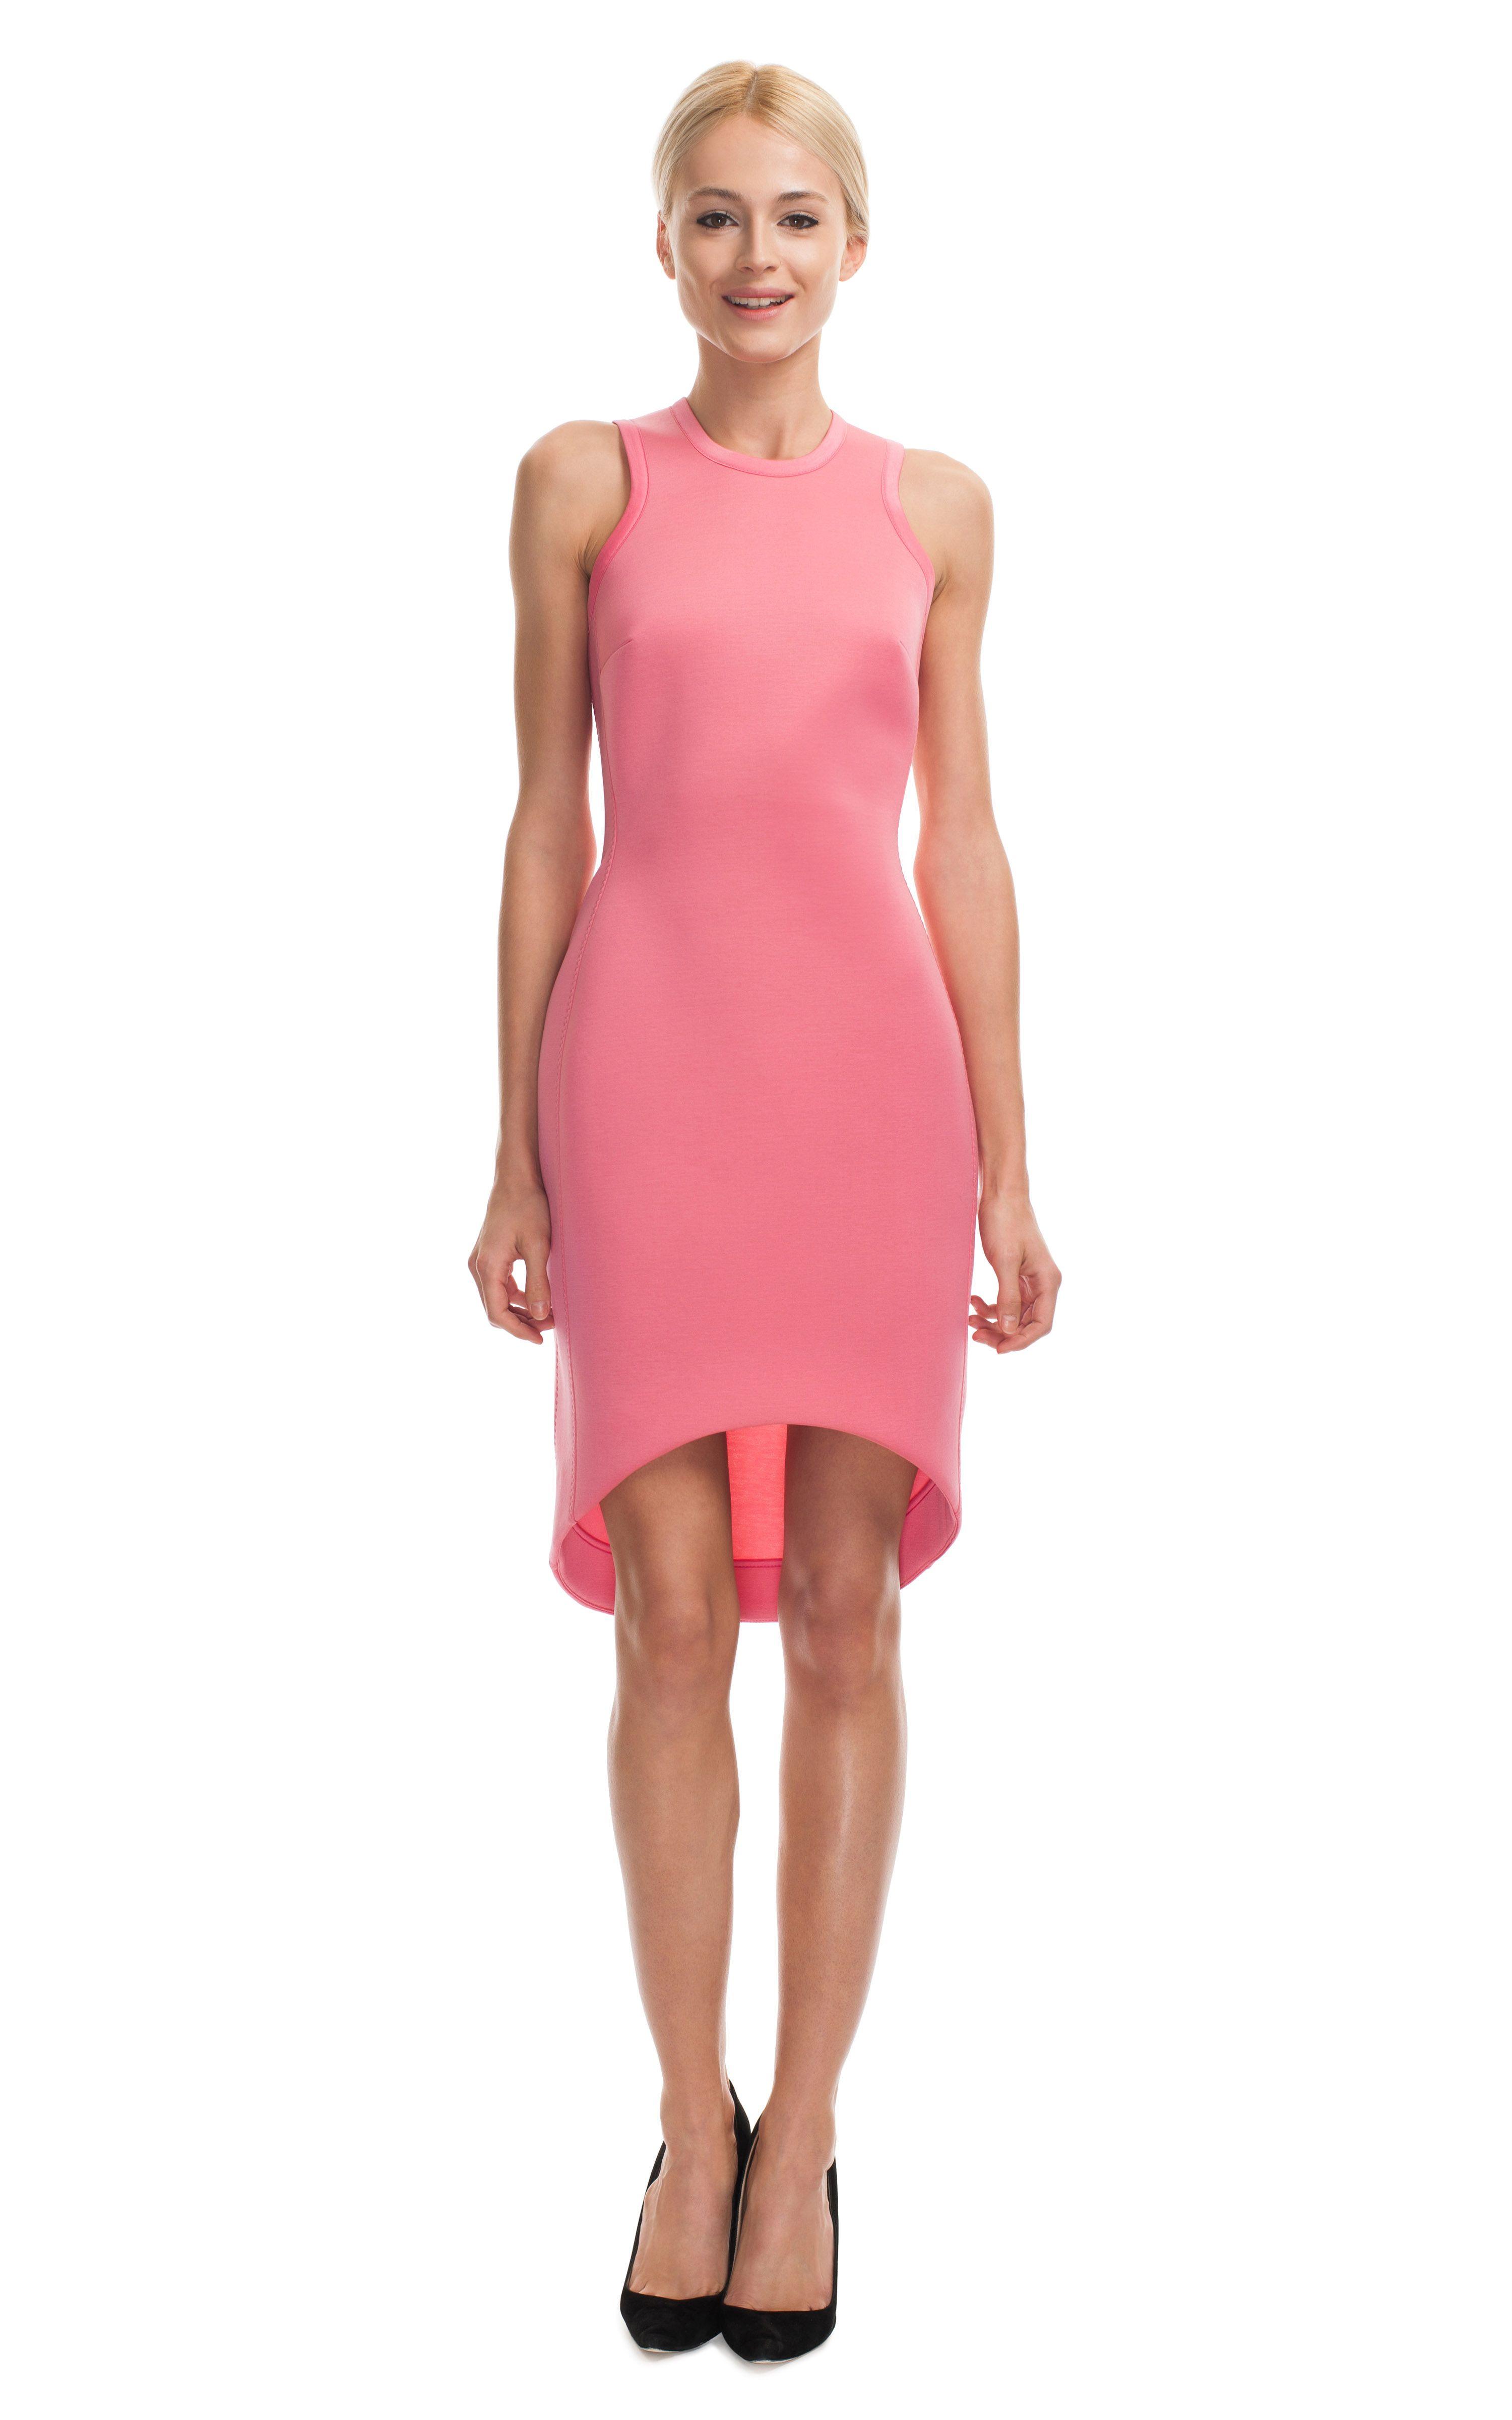 Josh Goot Bubble Gum Future Basics II Cut Away Dress at Moda ...